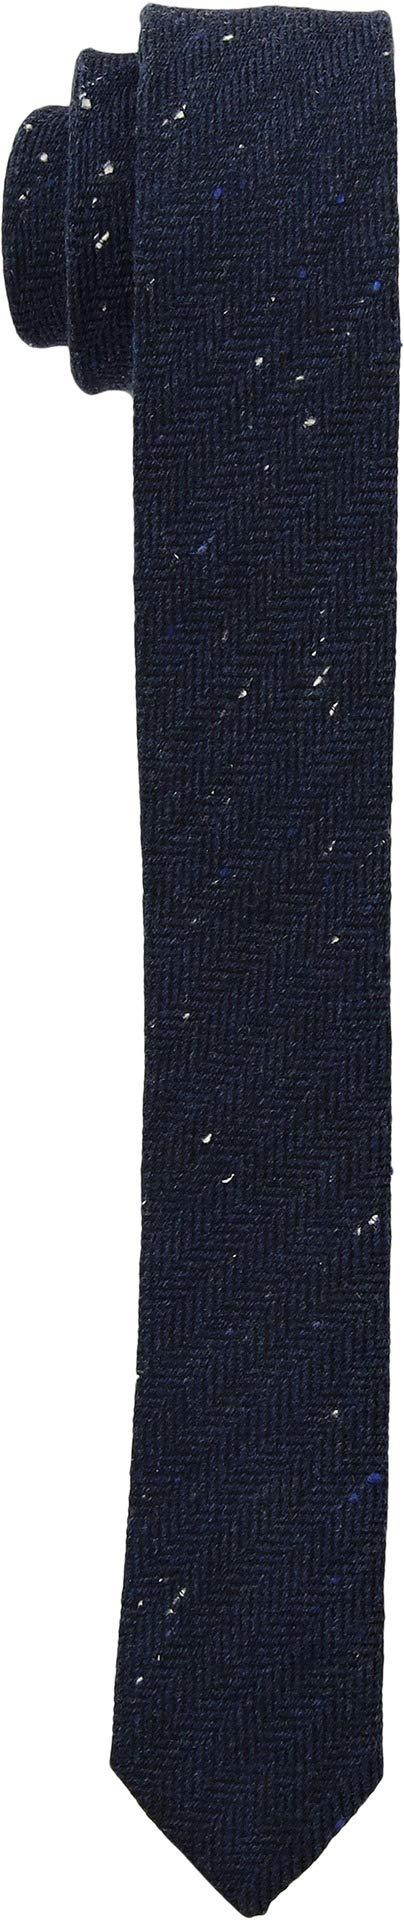 Appaman Kids Boy's Tie (Little Kids/Big Kids) Navy Speckle Herringbone LG/XL